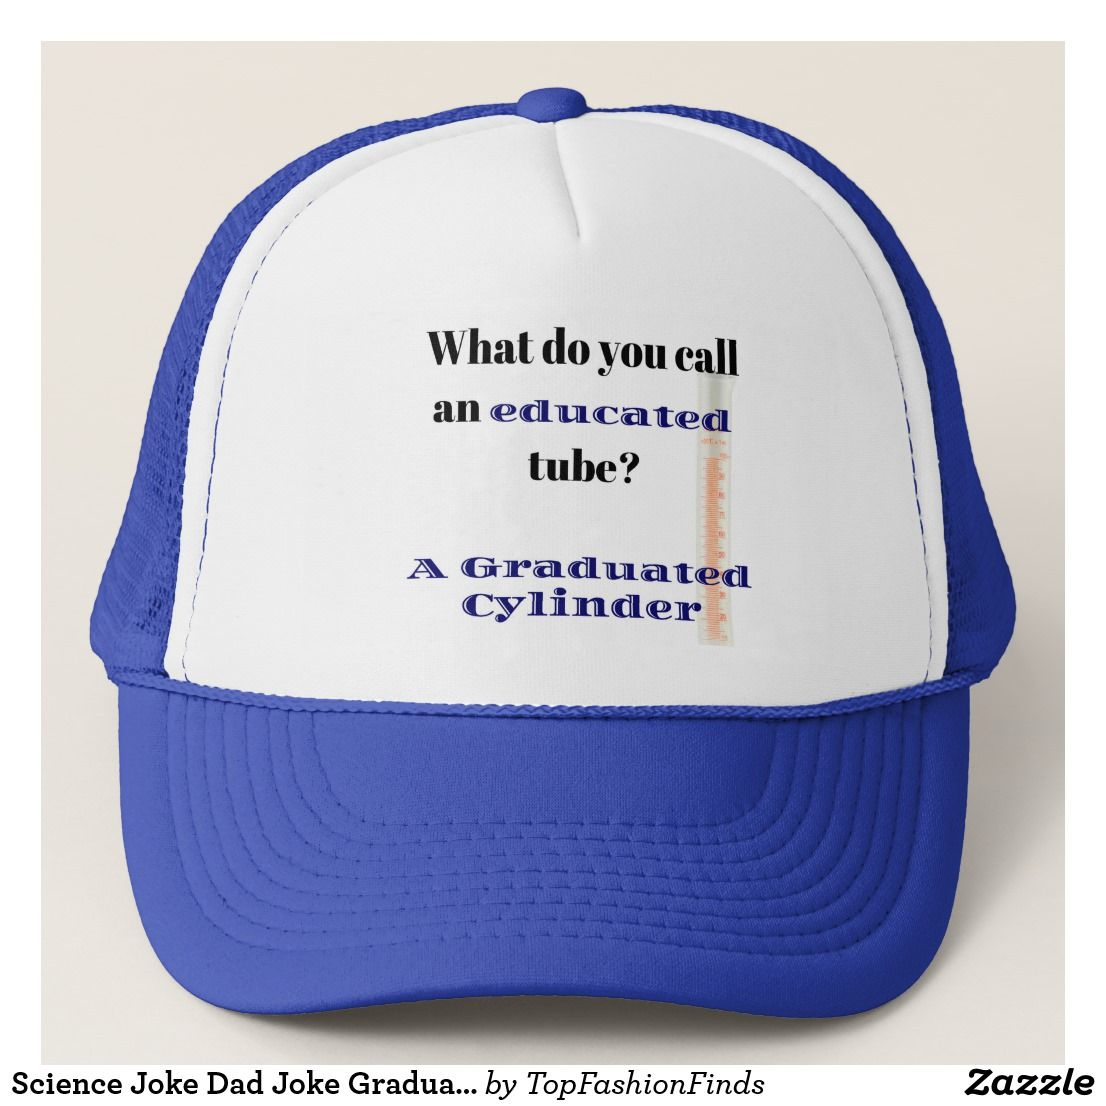 Science Joke Dad Joke Graduated Cylinder Trucker Hat Zazzle Com Science Jokes Graduated Cylinder Dad Jokes